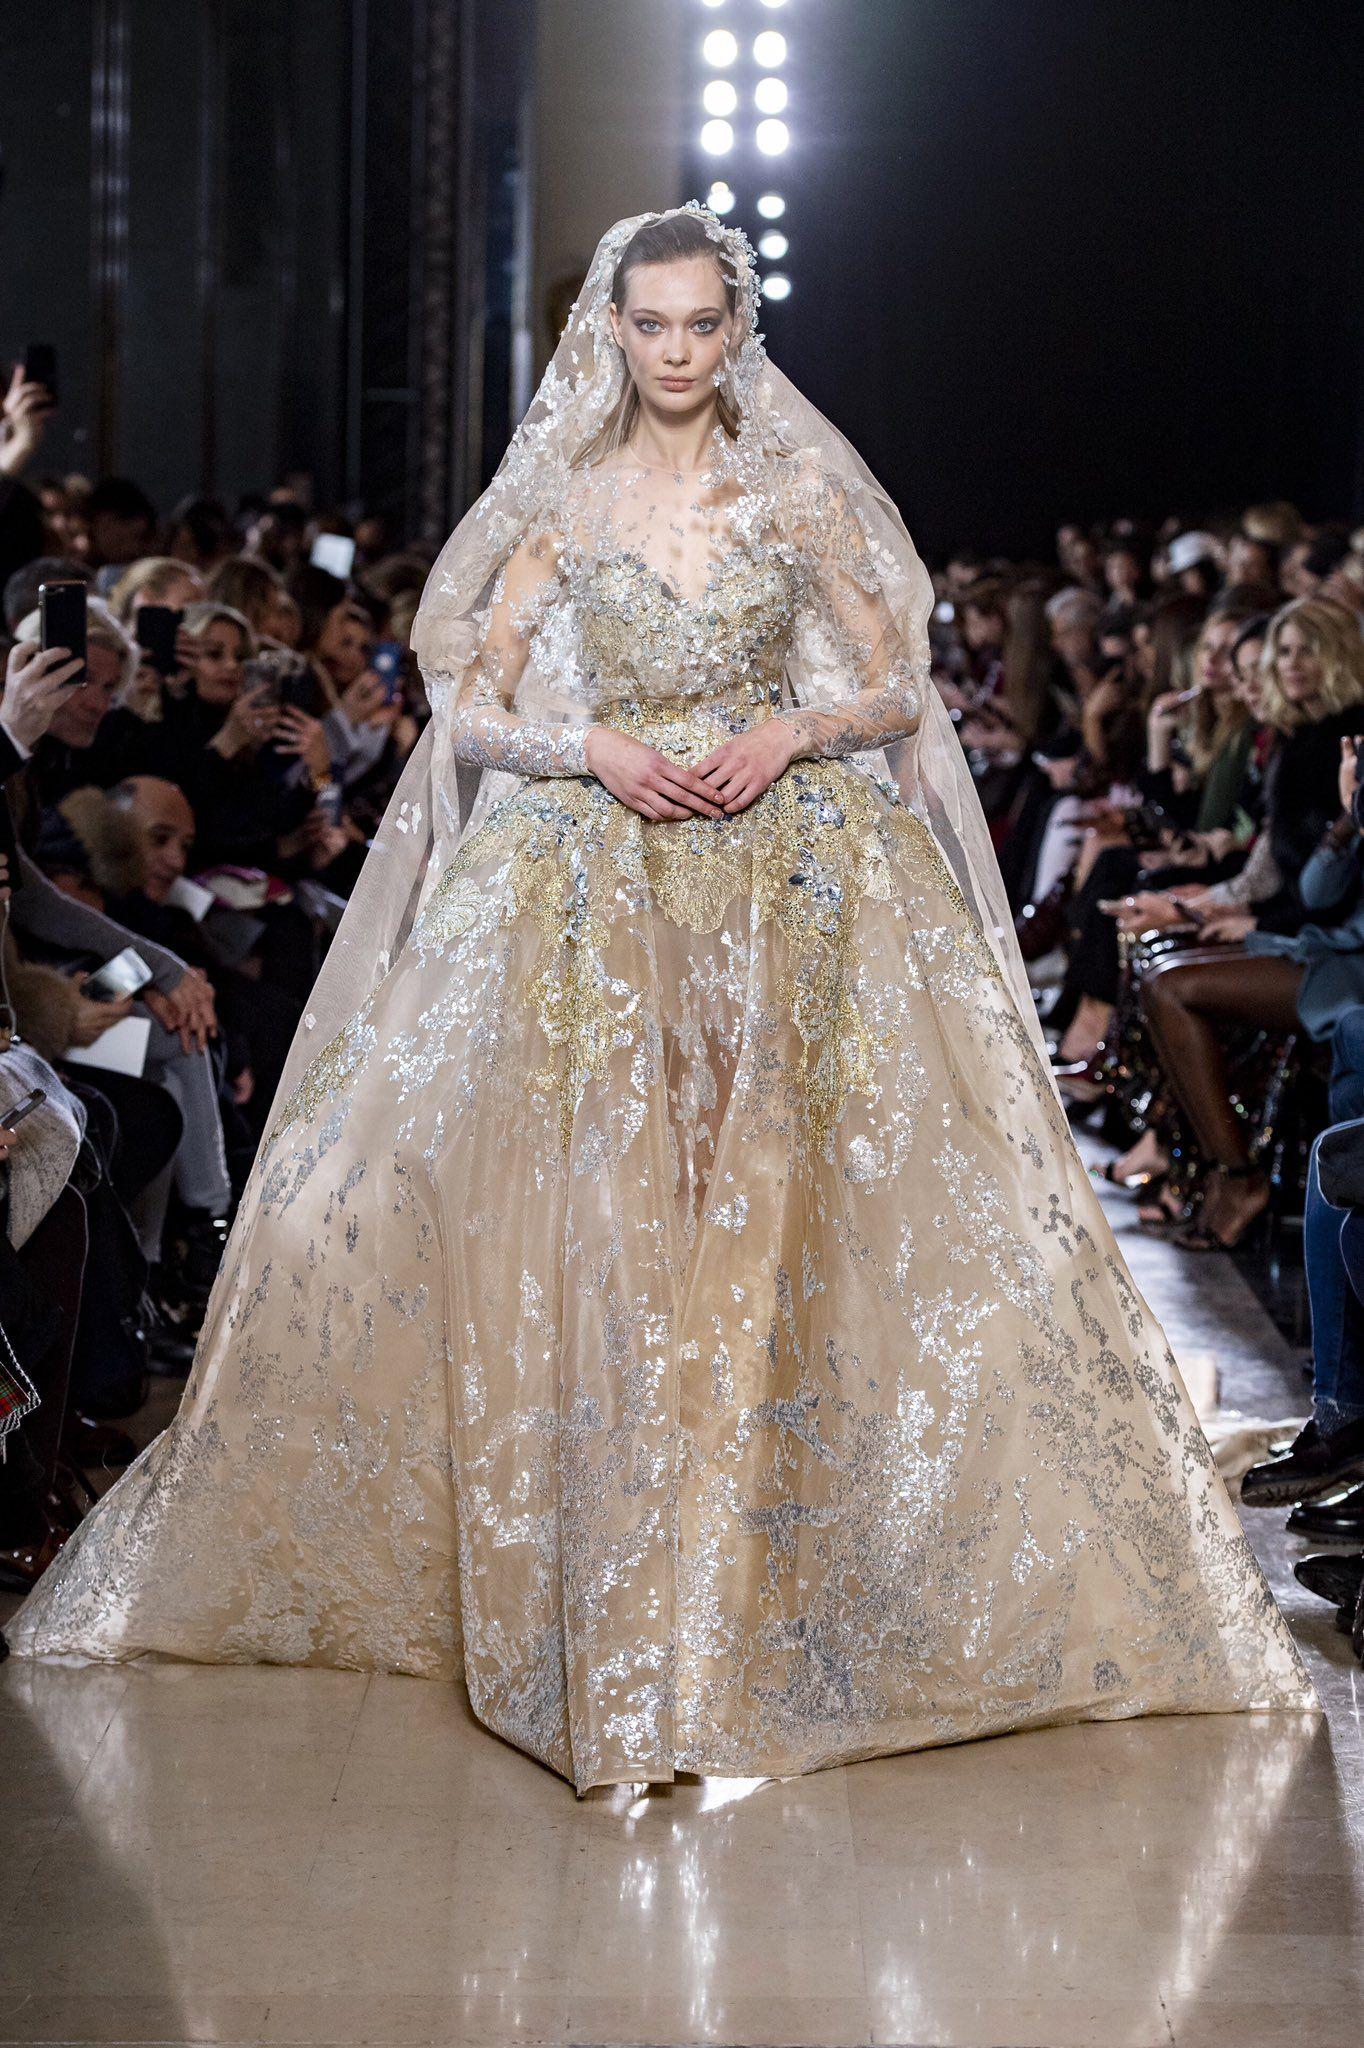 Elie Saab Haute Couture Elie Saab Bridal Trendy Wedding Dresses Gowns